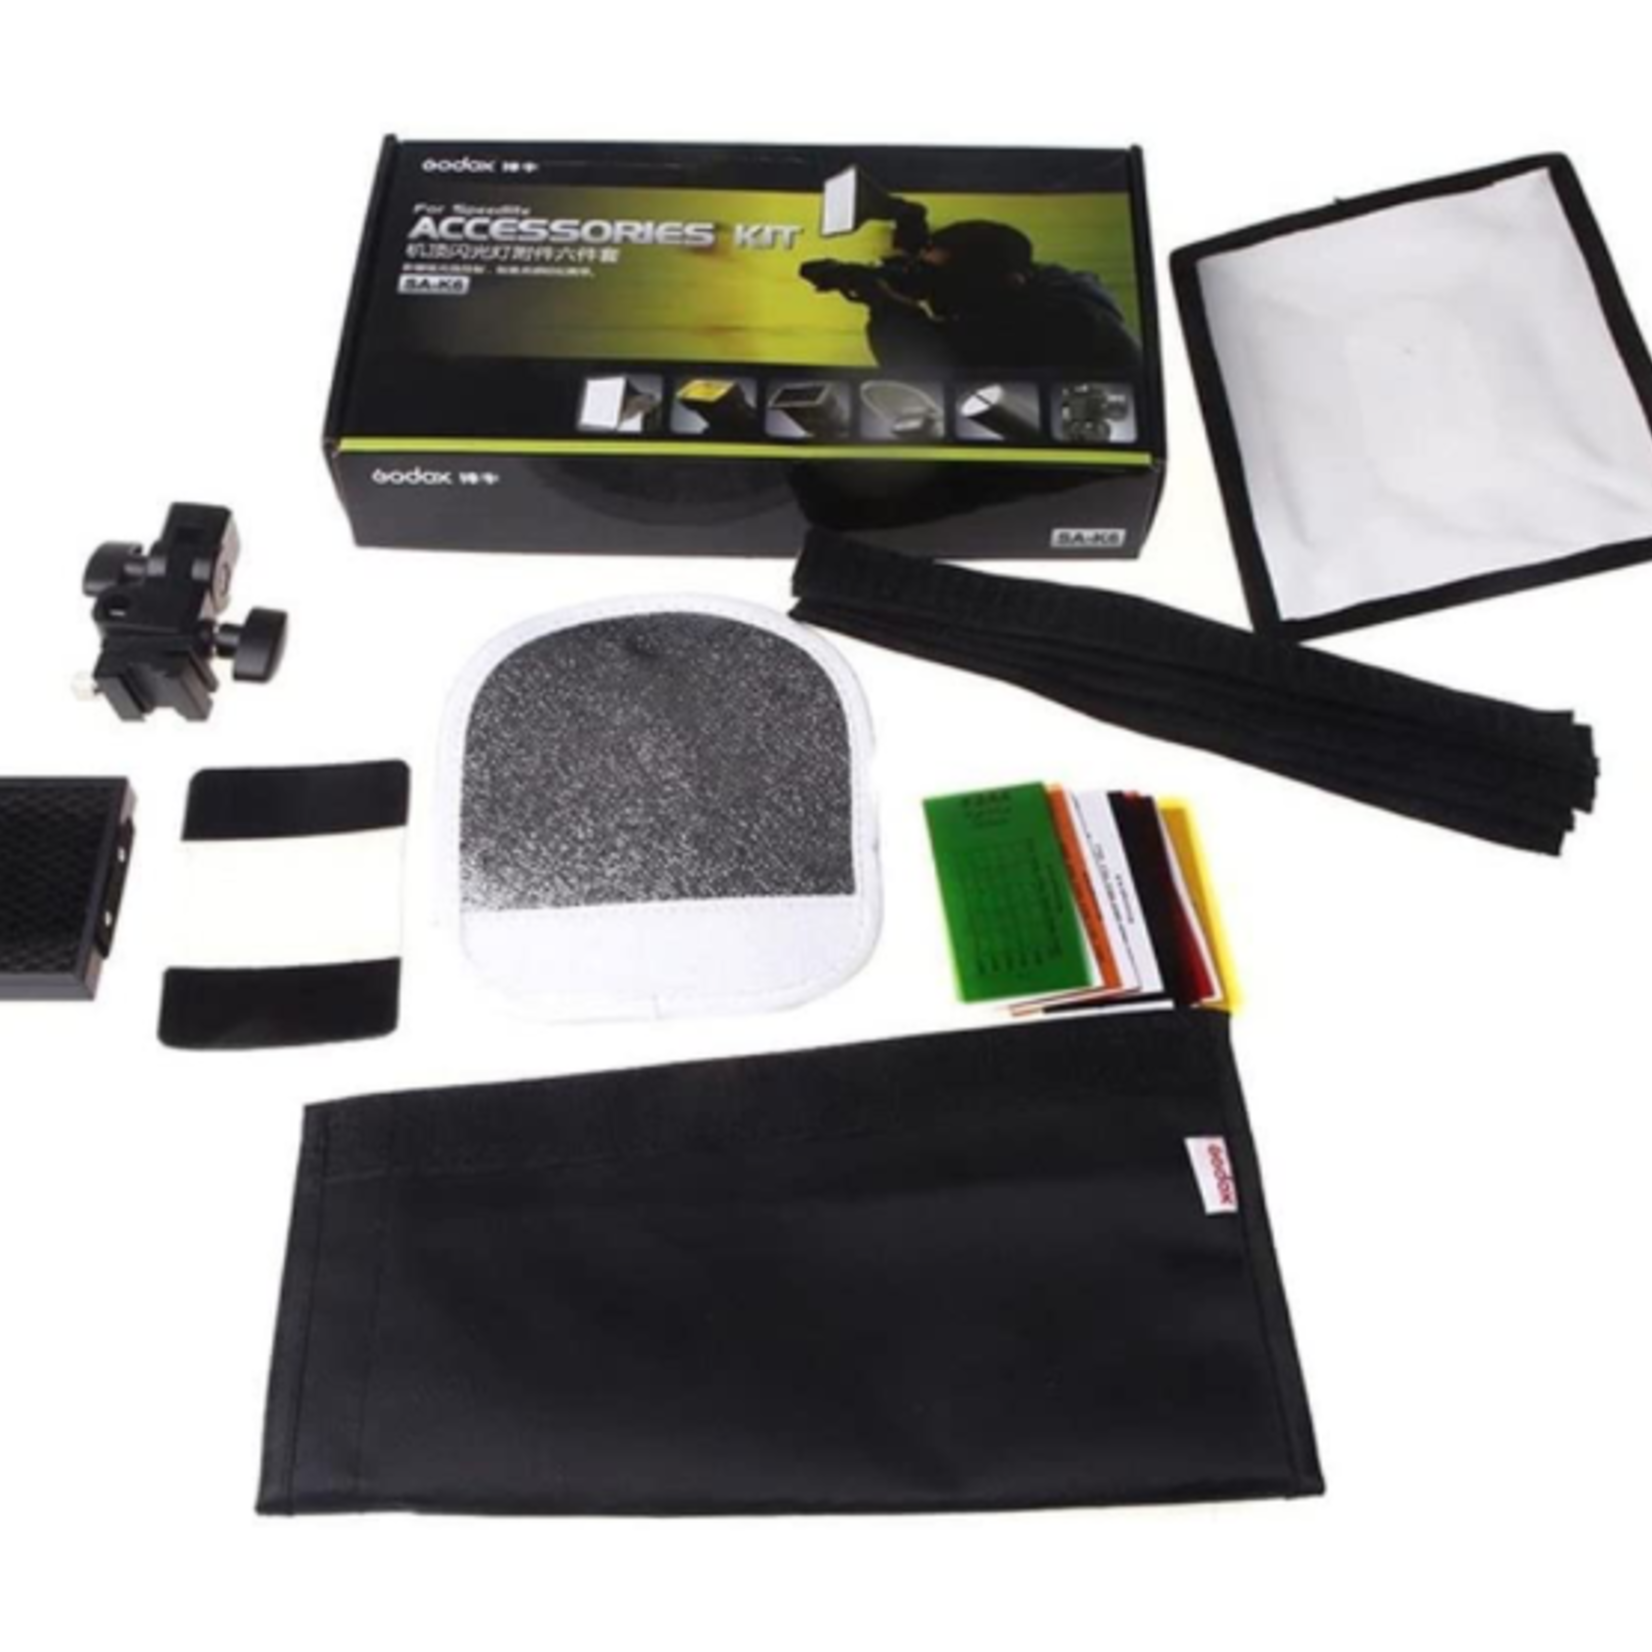 Godox GodoxSpeedlite Accessory Kit